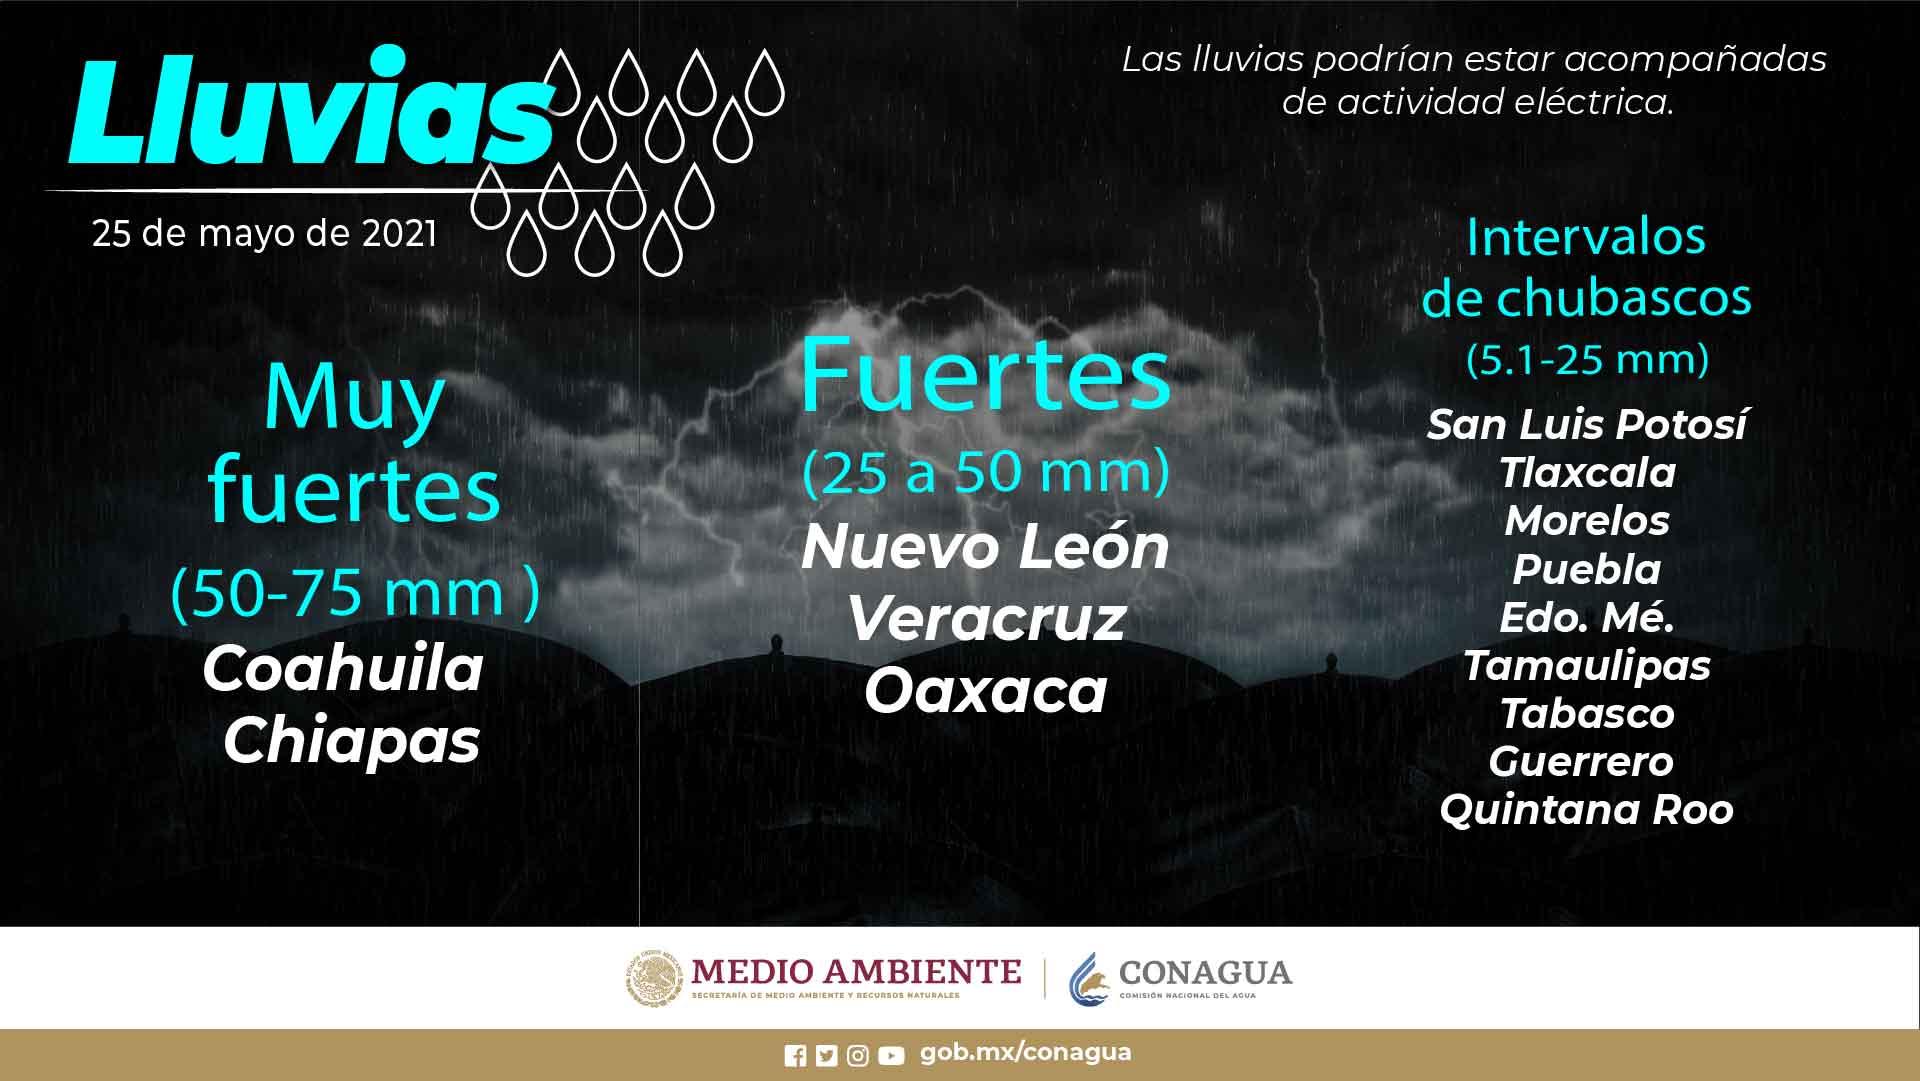 Se prevé caída de granizo en Tlaxcala para el dia de hoy